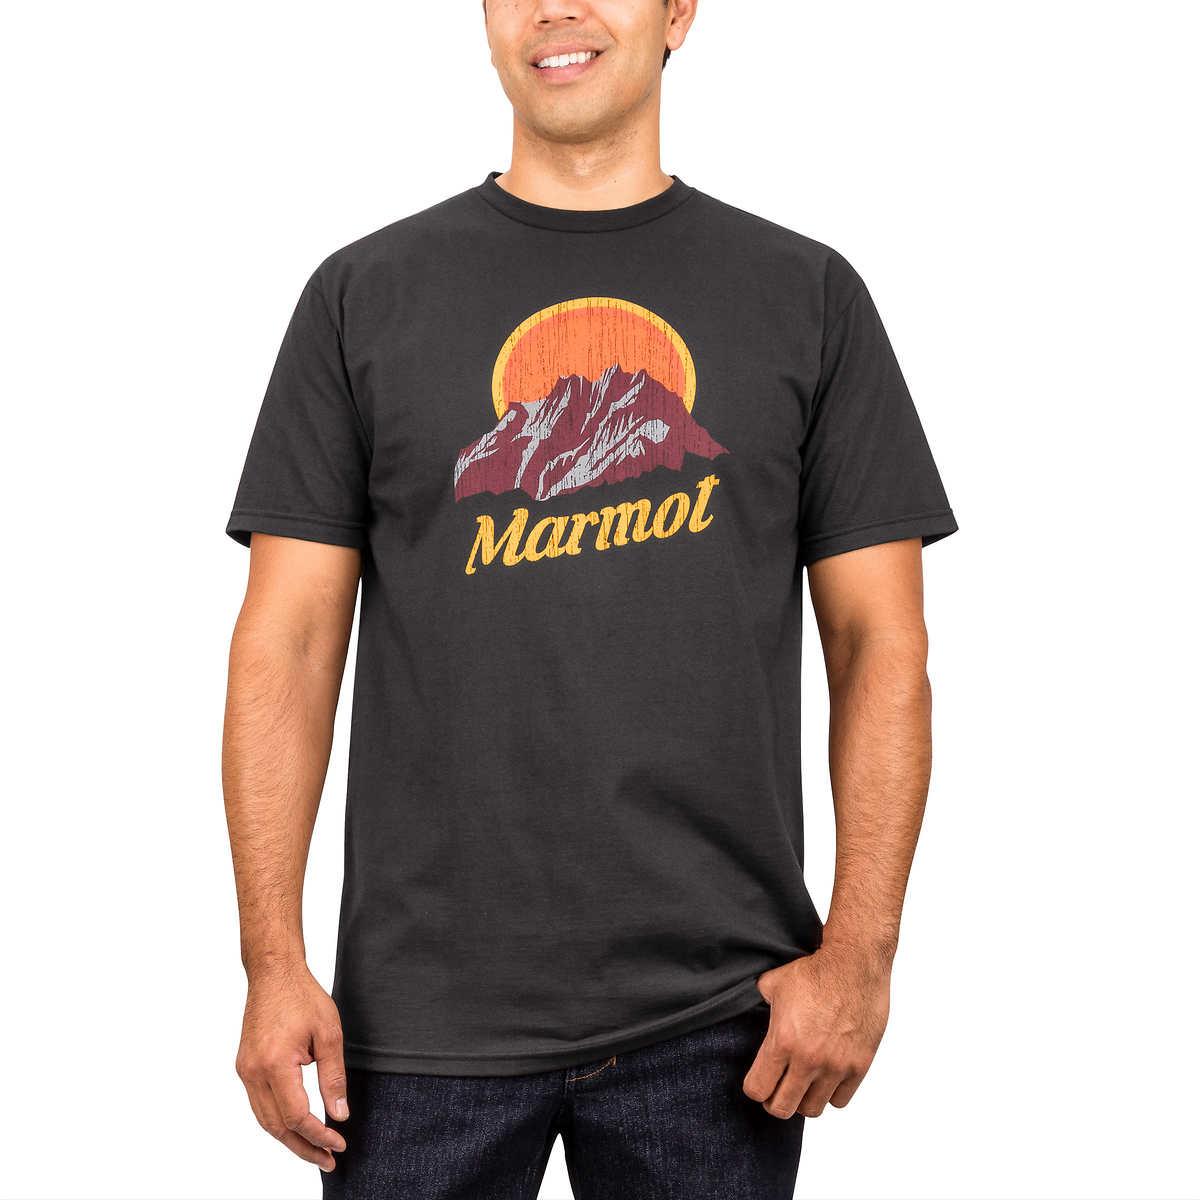 1c11159f2 Marmot Men's Cotton Logo Tee